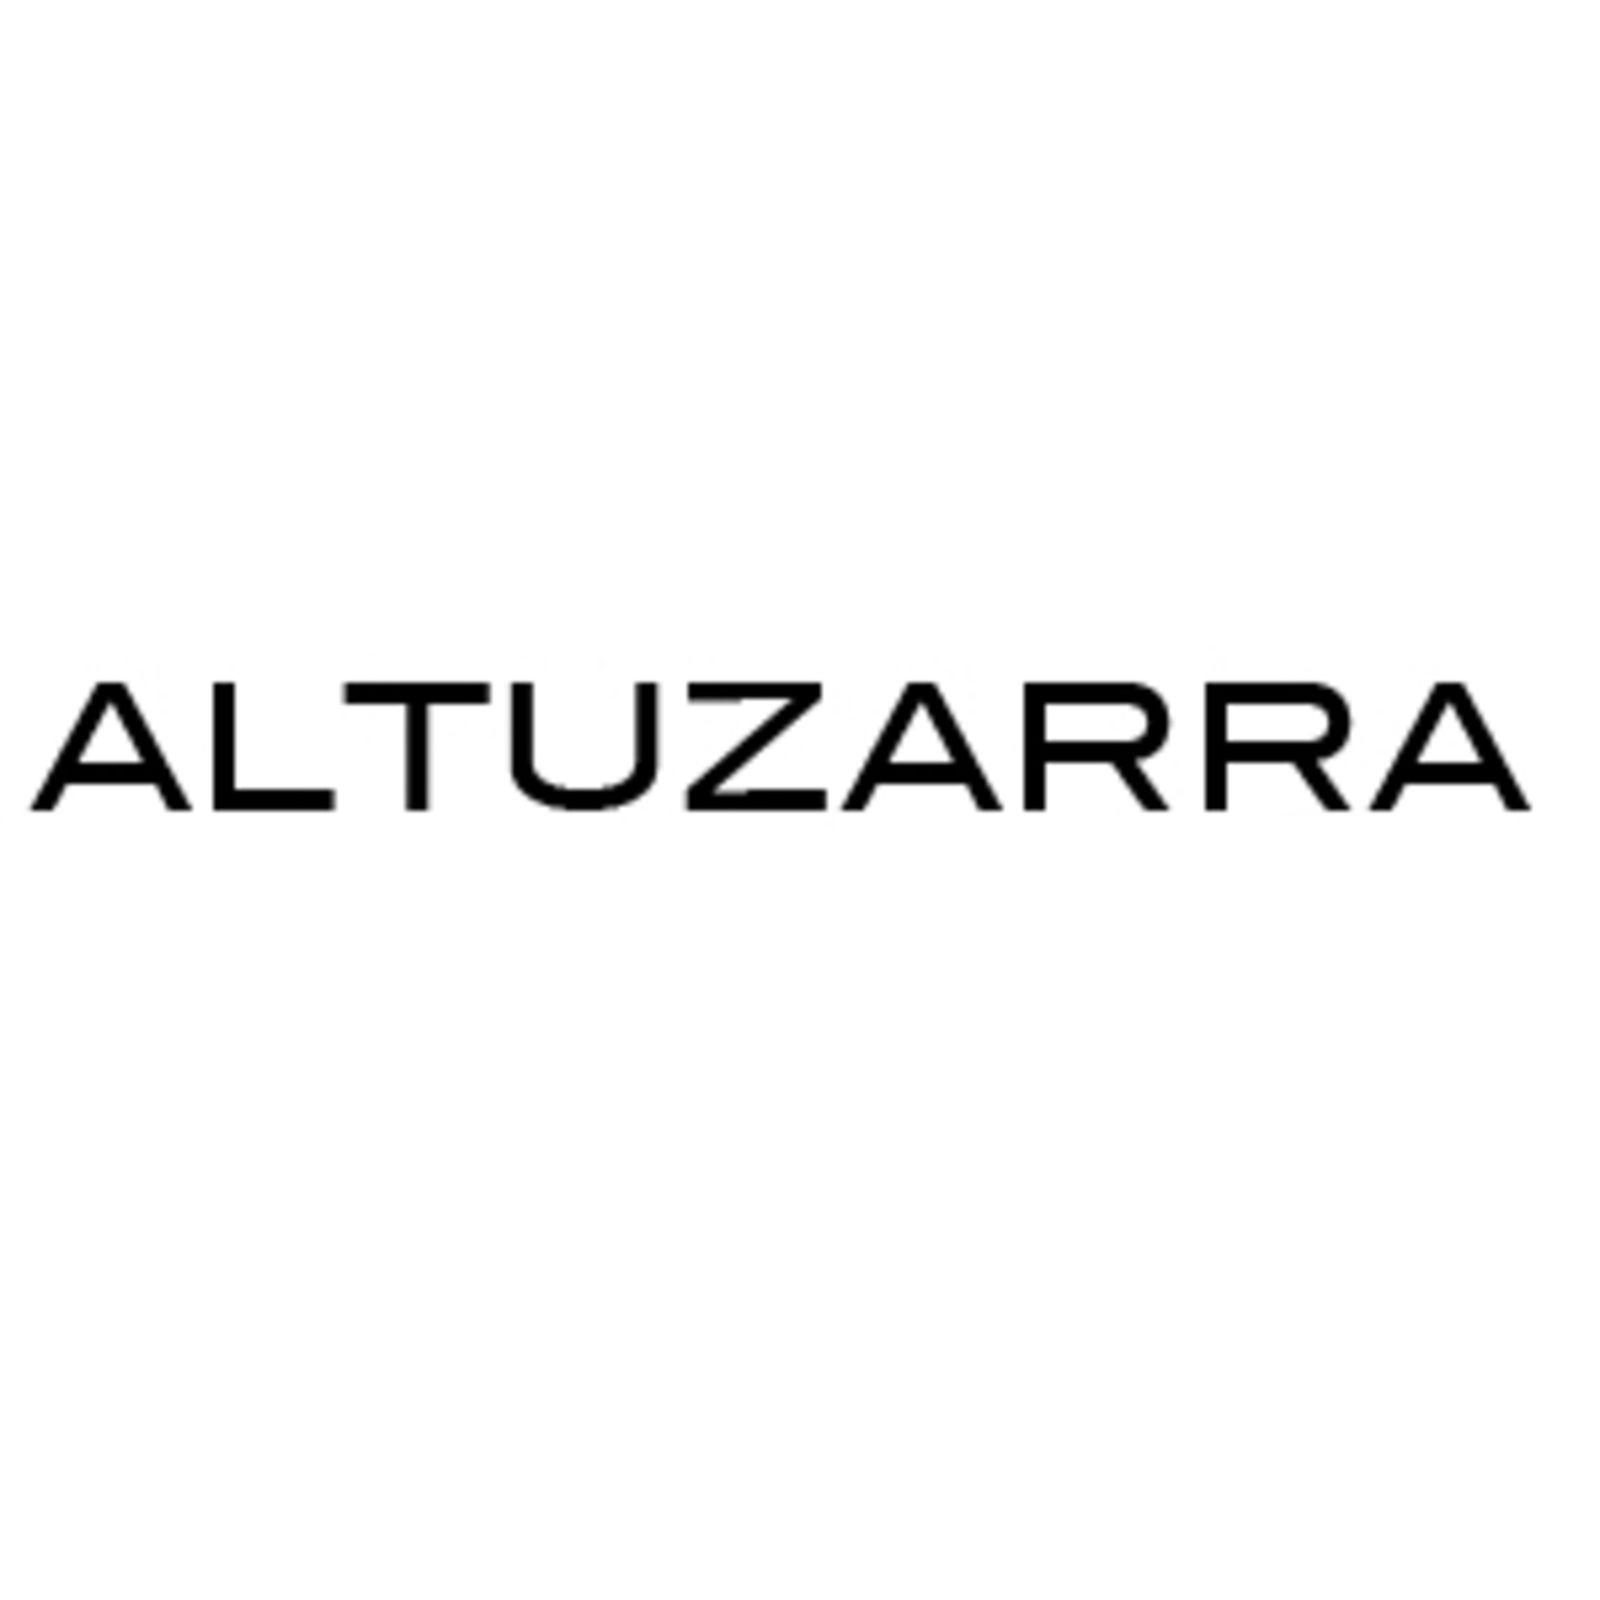 ALTUZARRA